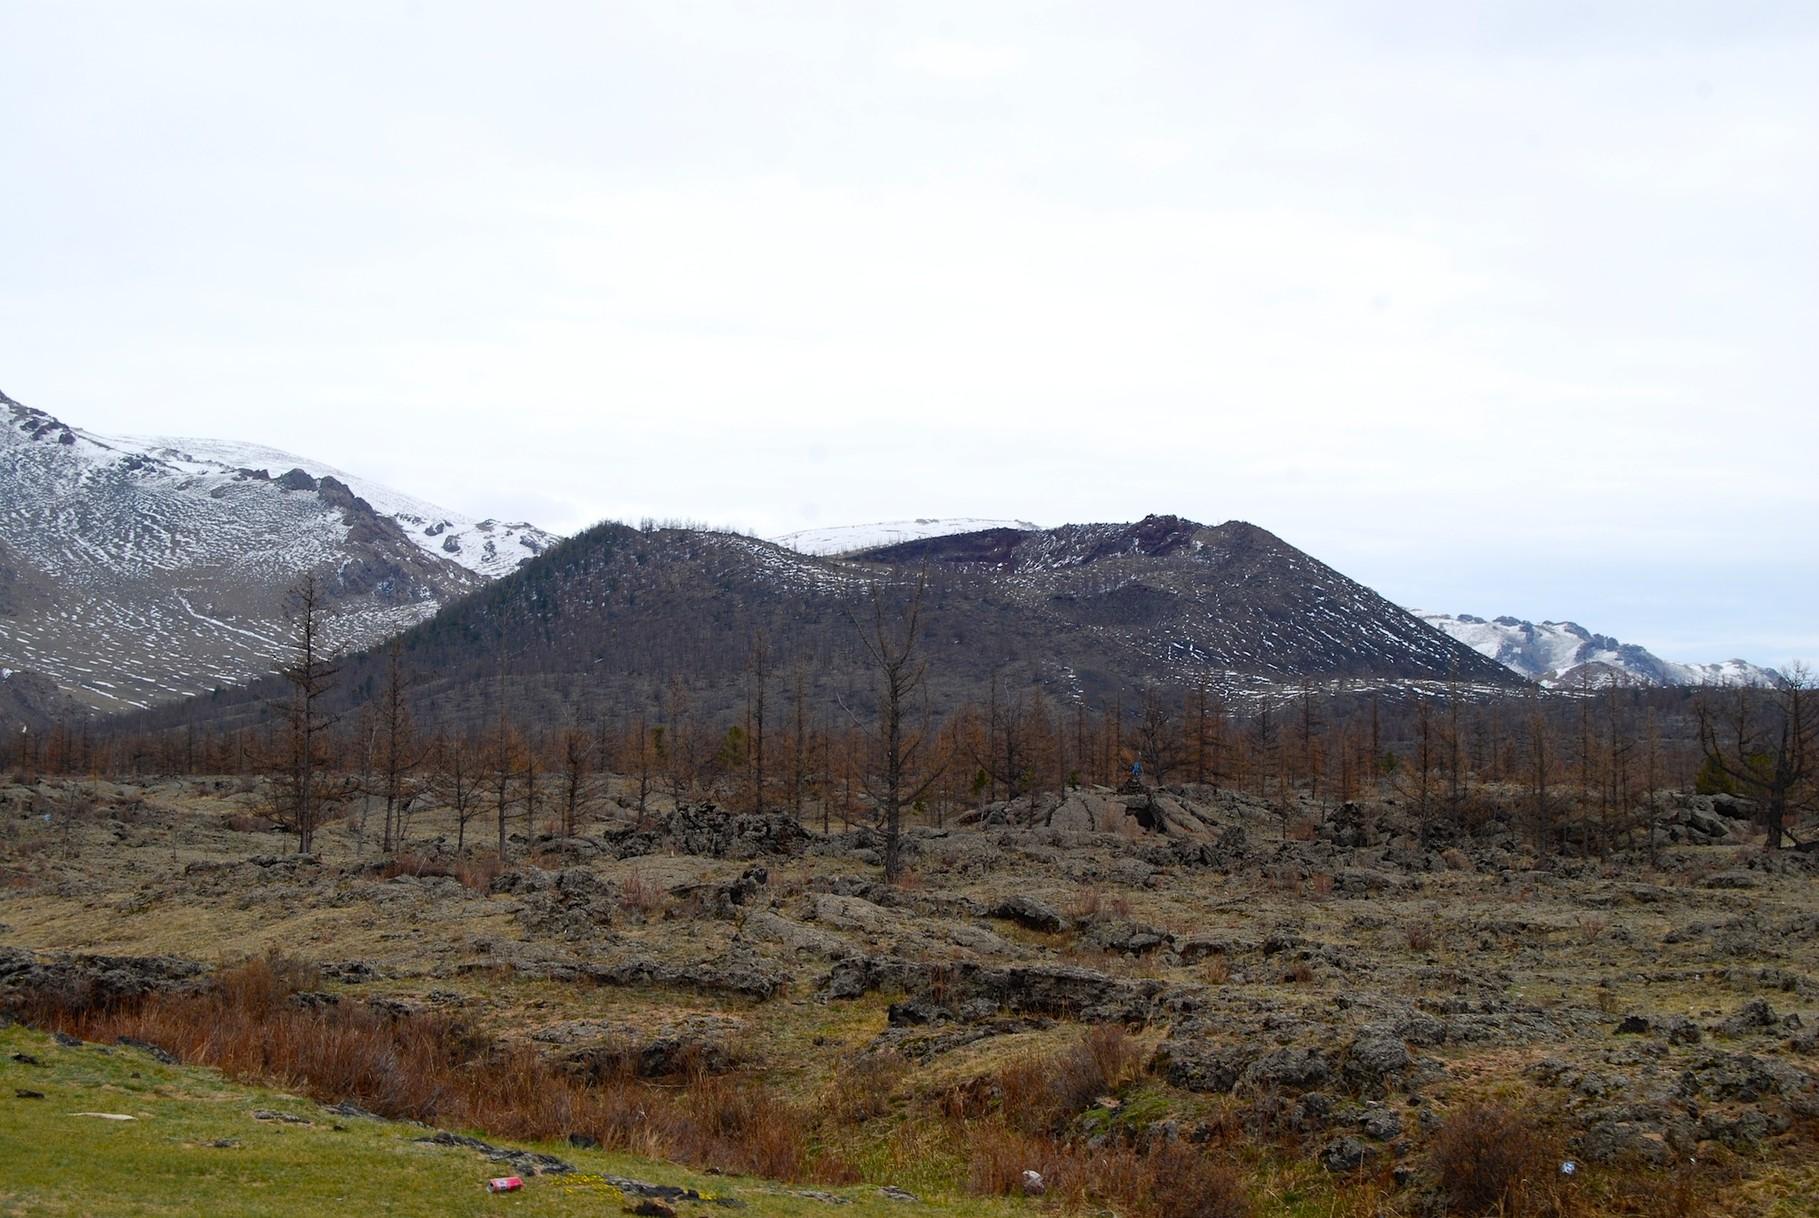 Khorgo Uul